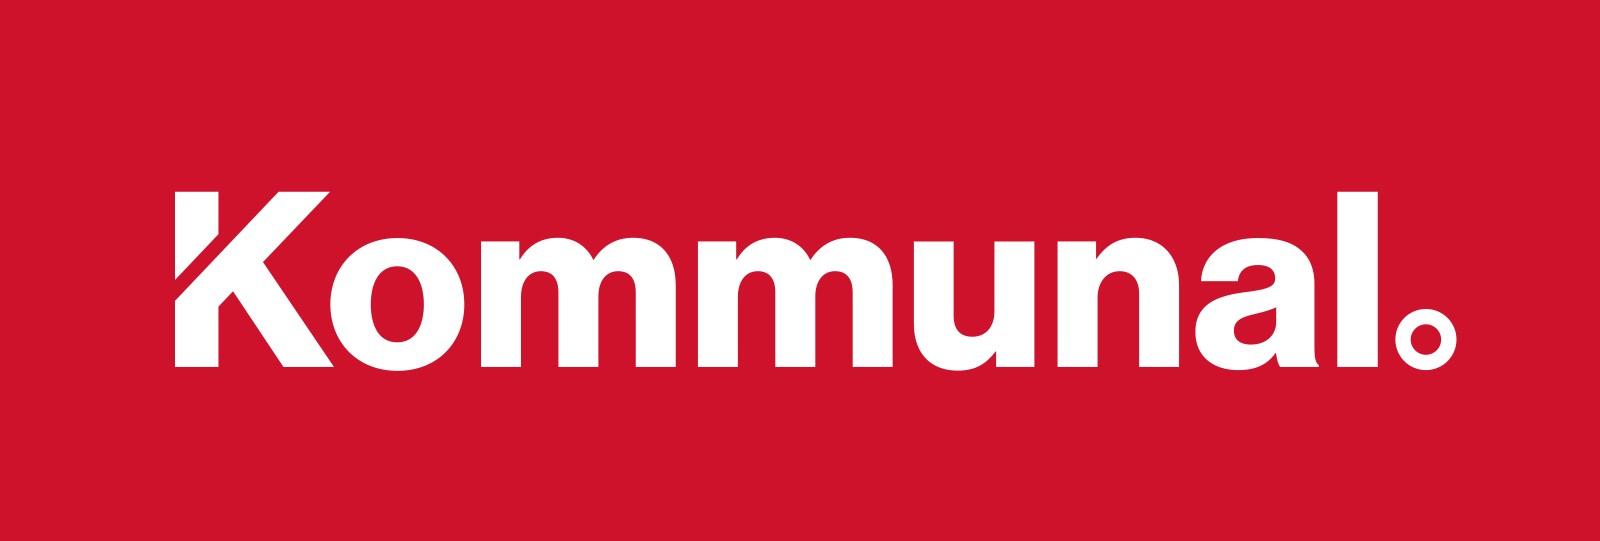 Kommunals logotyp mot röd bakgrund